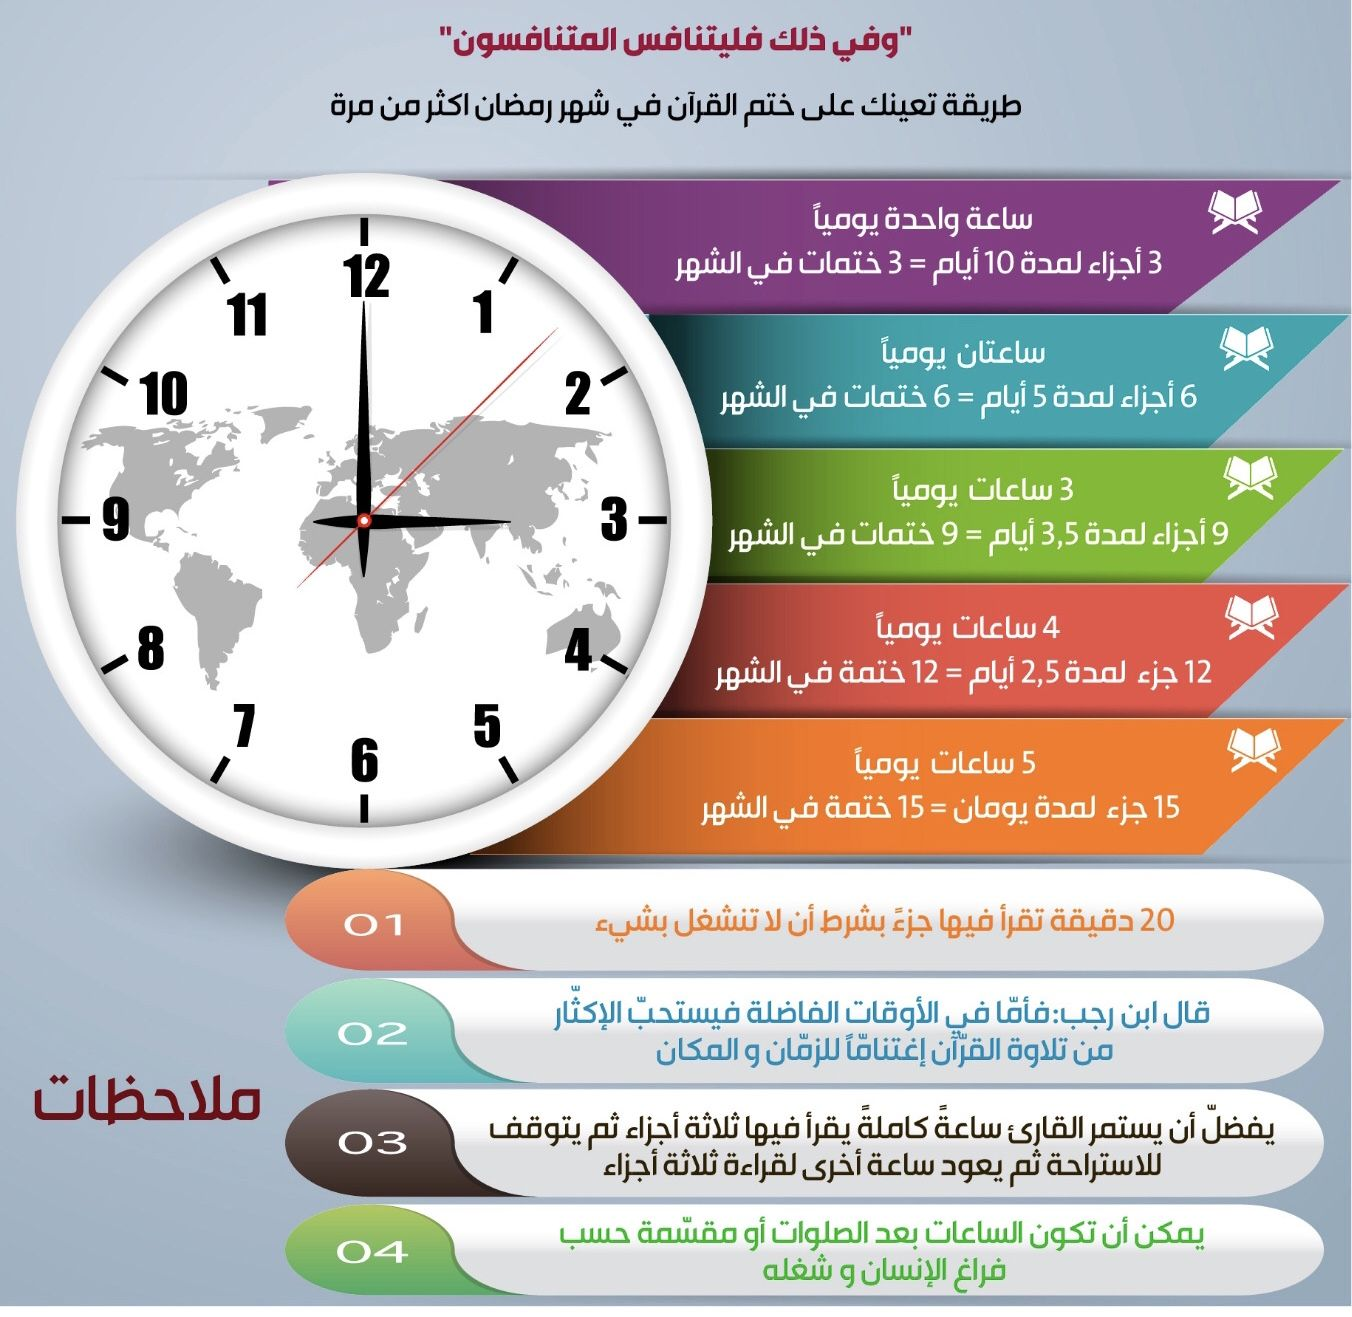 Pin By Fawaz Almoradi On أبو الفوز حبيب الكل Pandora Screenshot